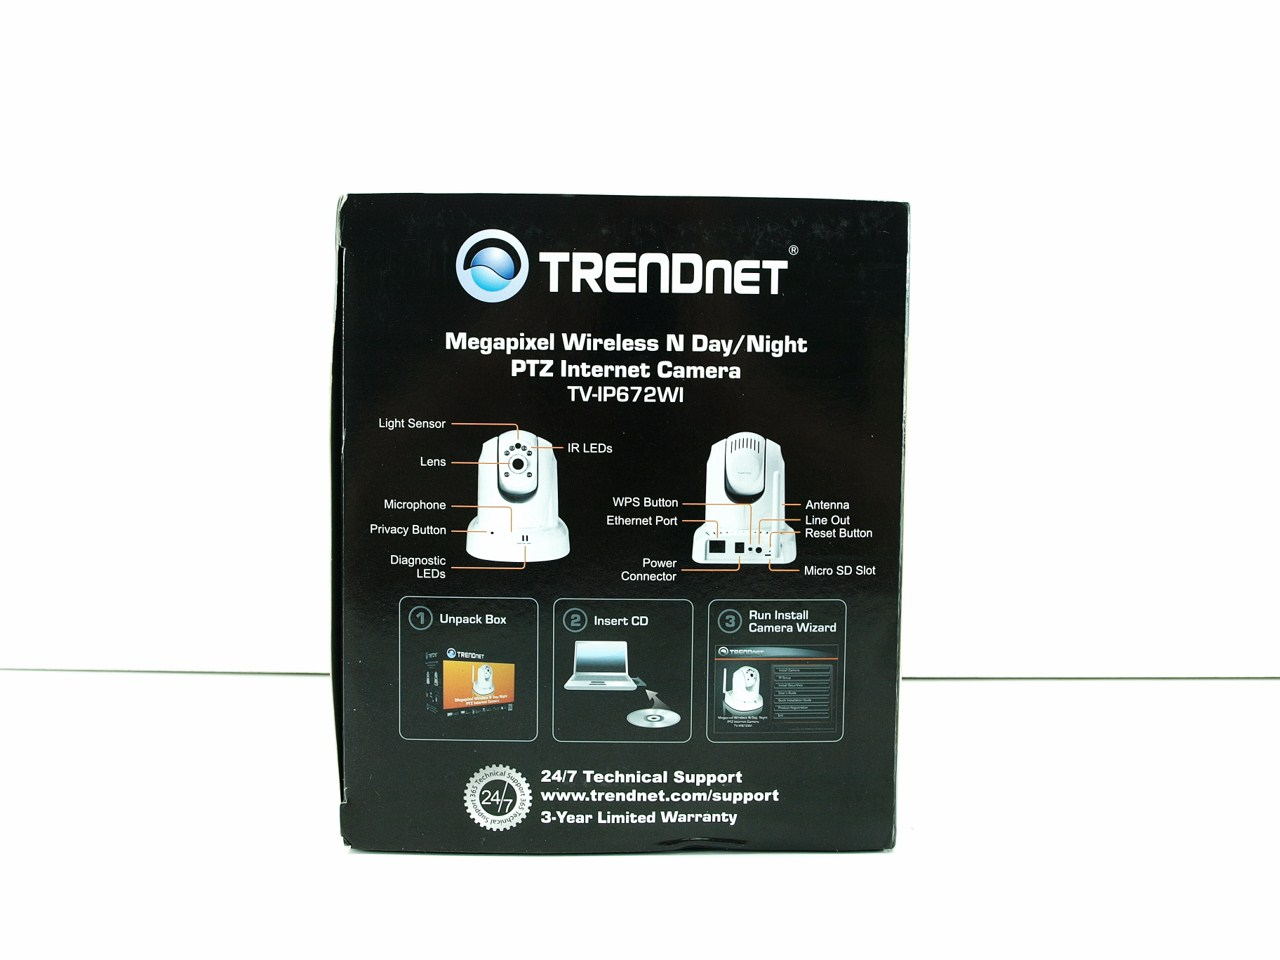 TRENDnet TV-IP672WI Megapixel Wireless Day/Night PTZ IP Camera Review